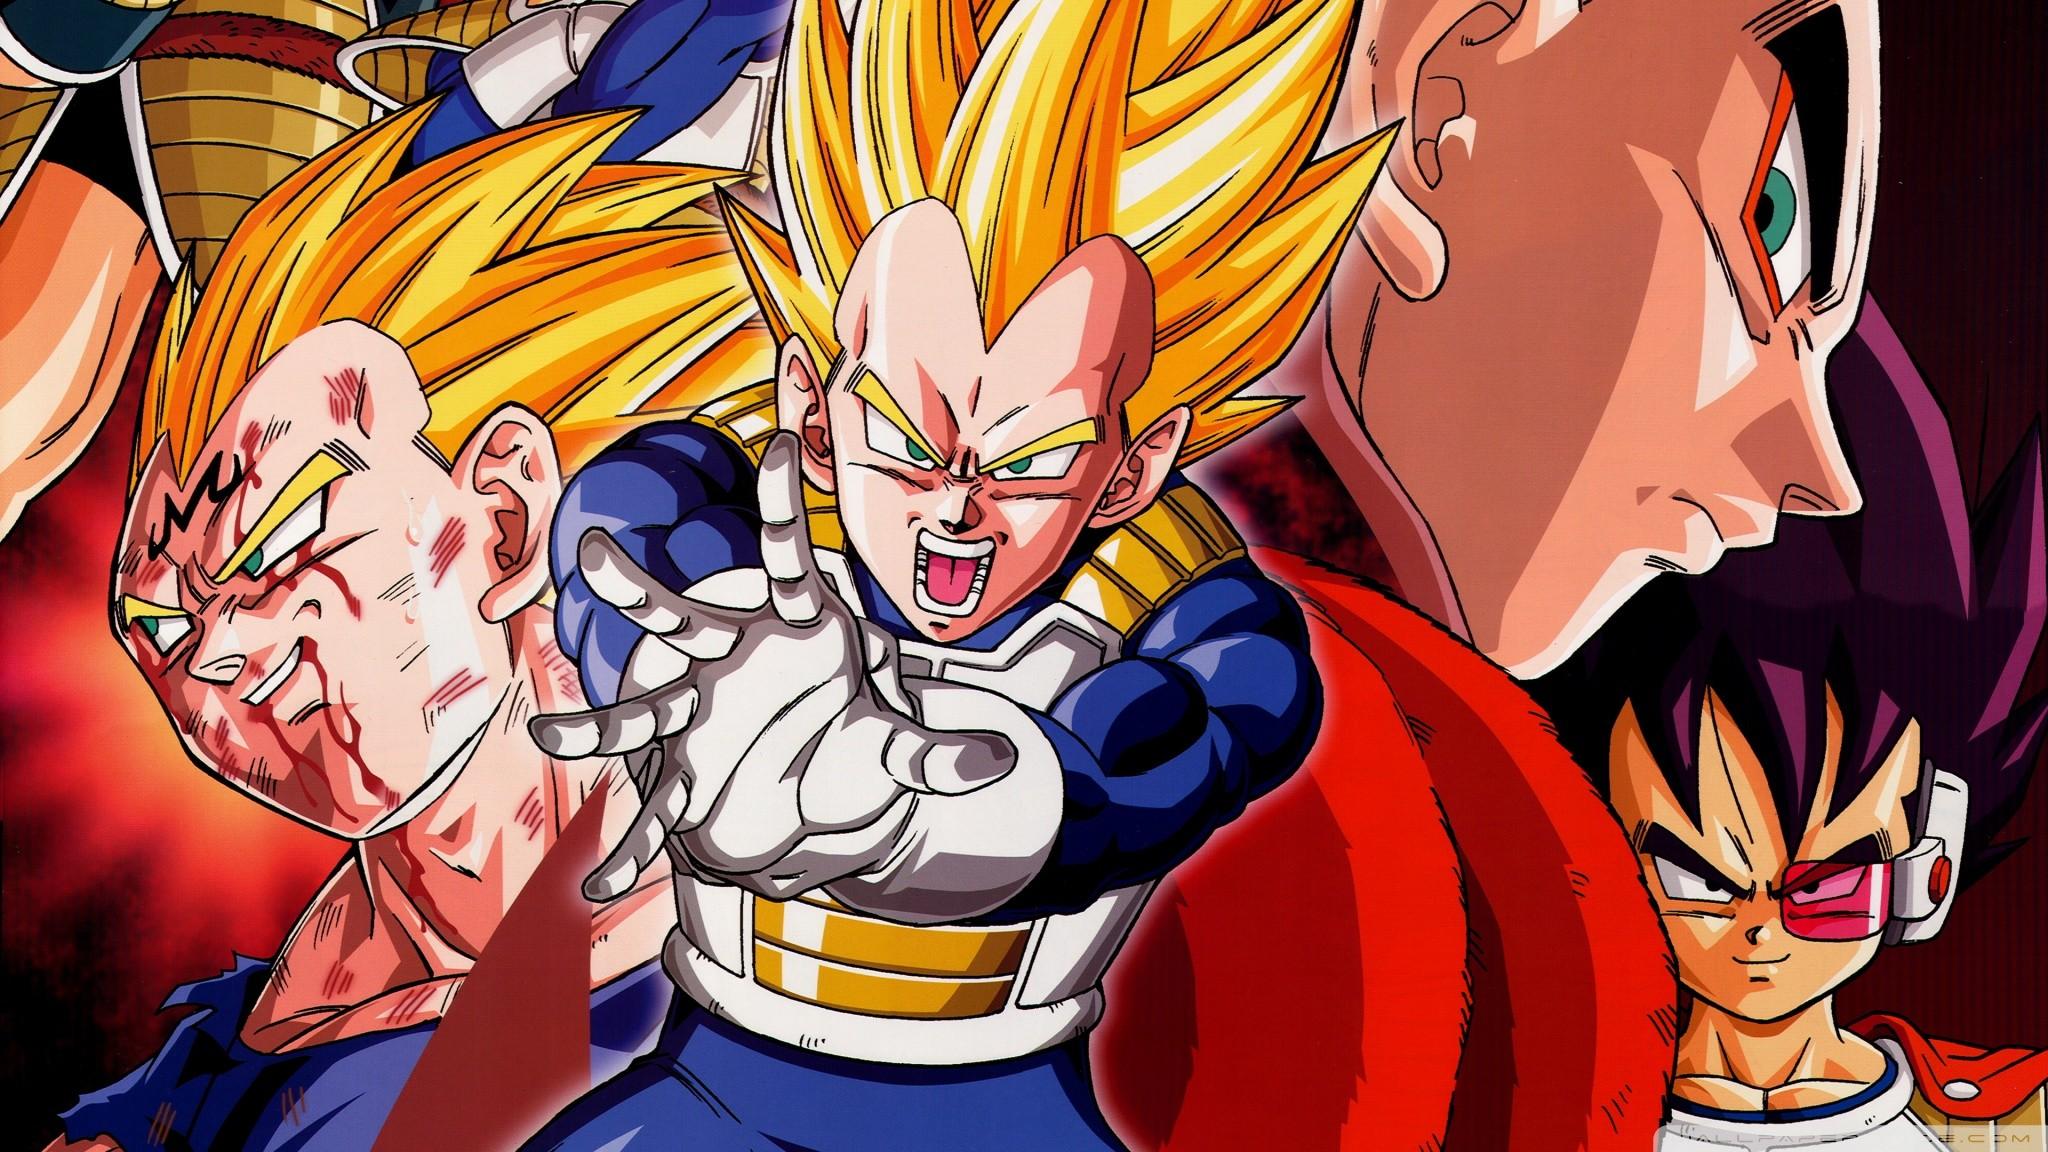 Super Saiyan Goku Vs Vegeta HD Wallpaper   1920×1080   ID:56333